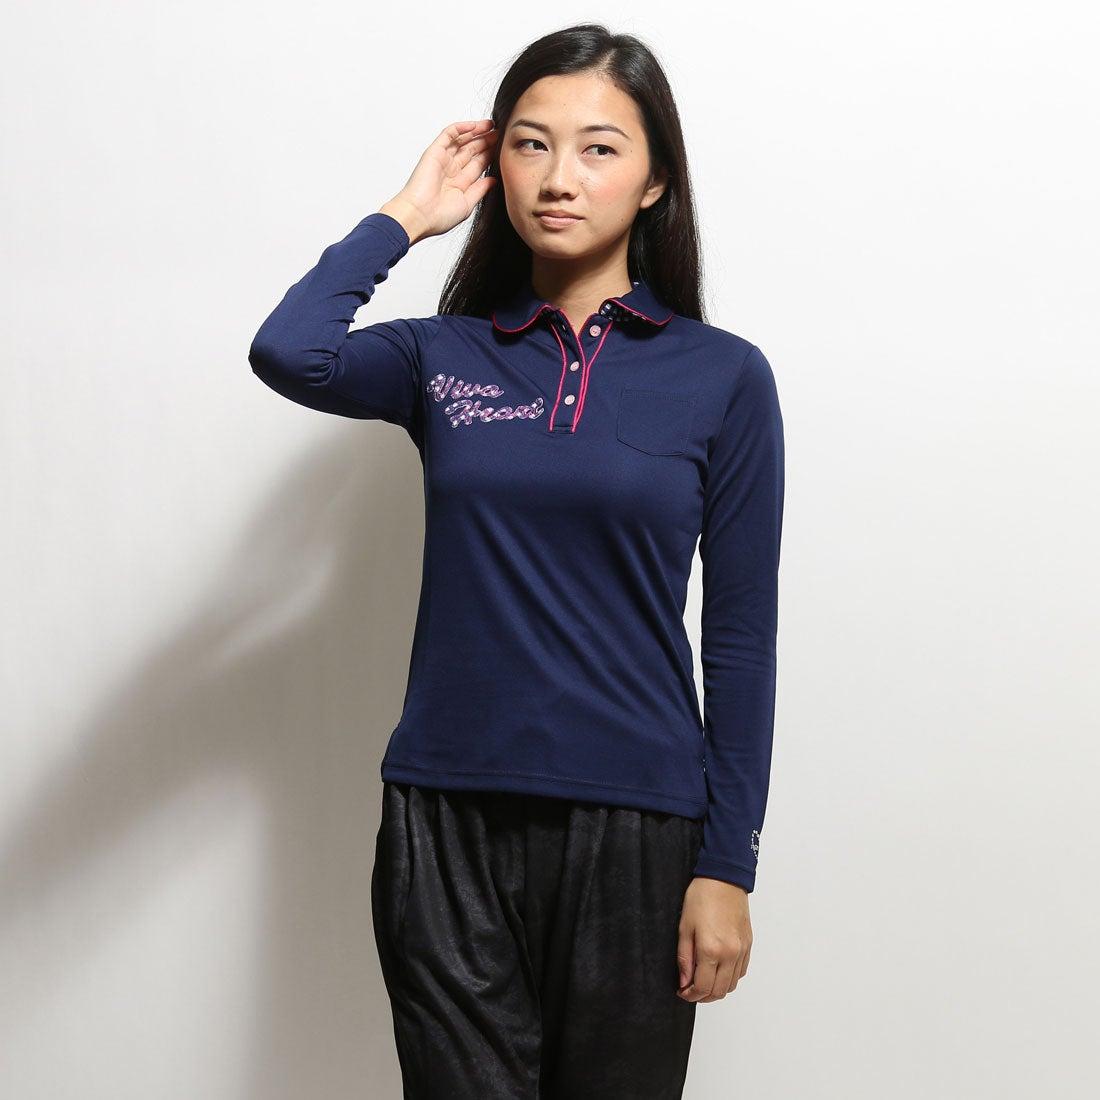 【SALE 62%OFF】ビバハート VIVA HEART ゴルフシャツ UV丸衿★長袖ポロ 018-22910 ネイビー (ネイビー) レディース